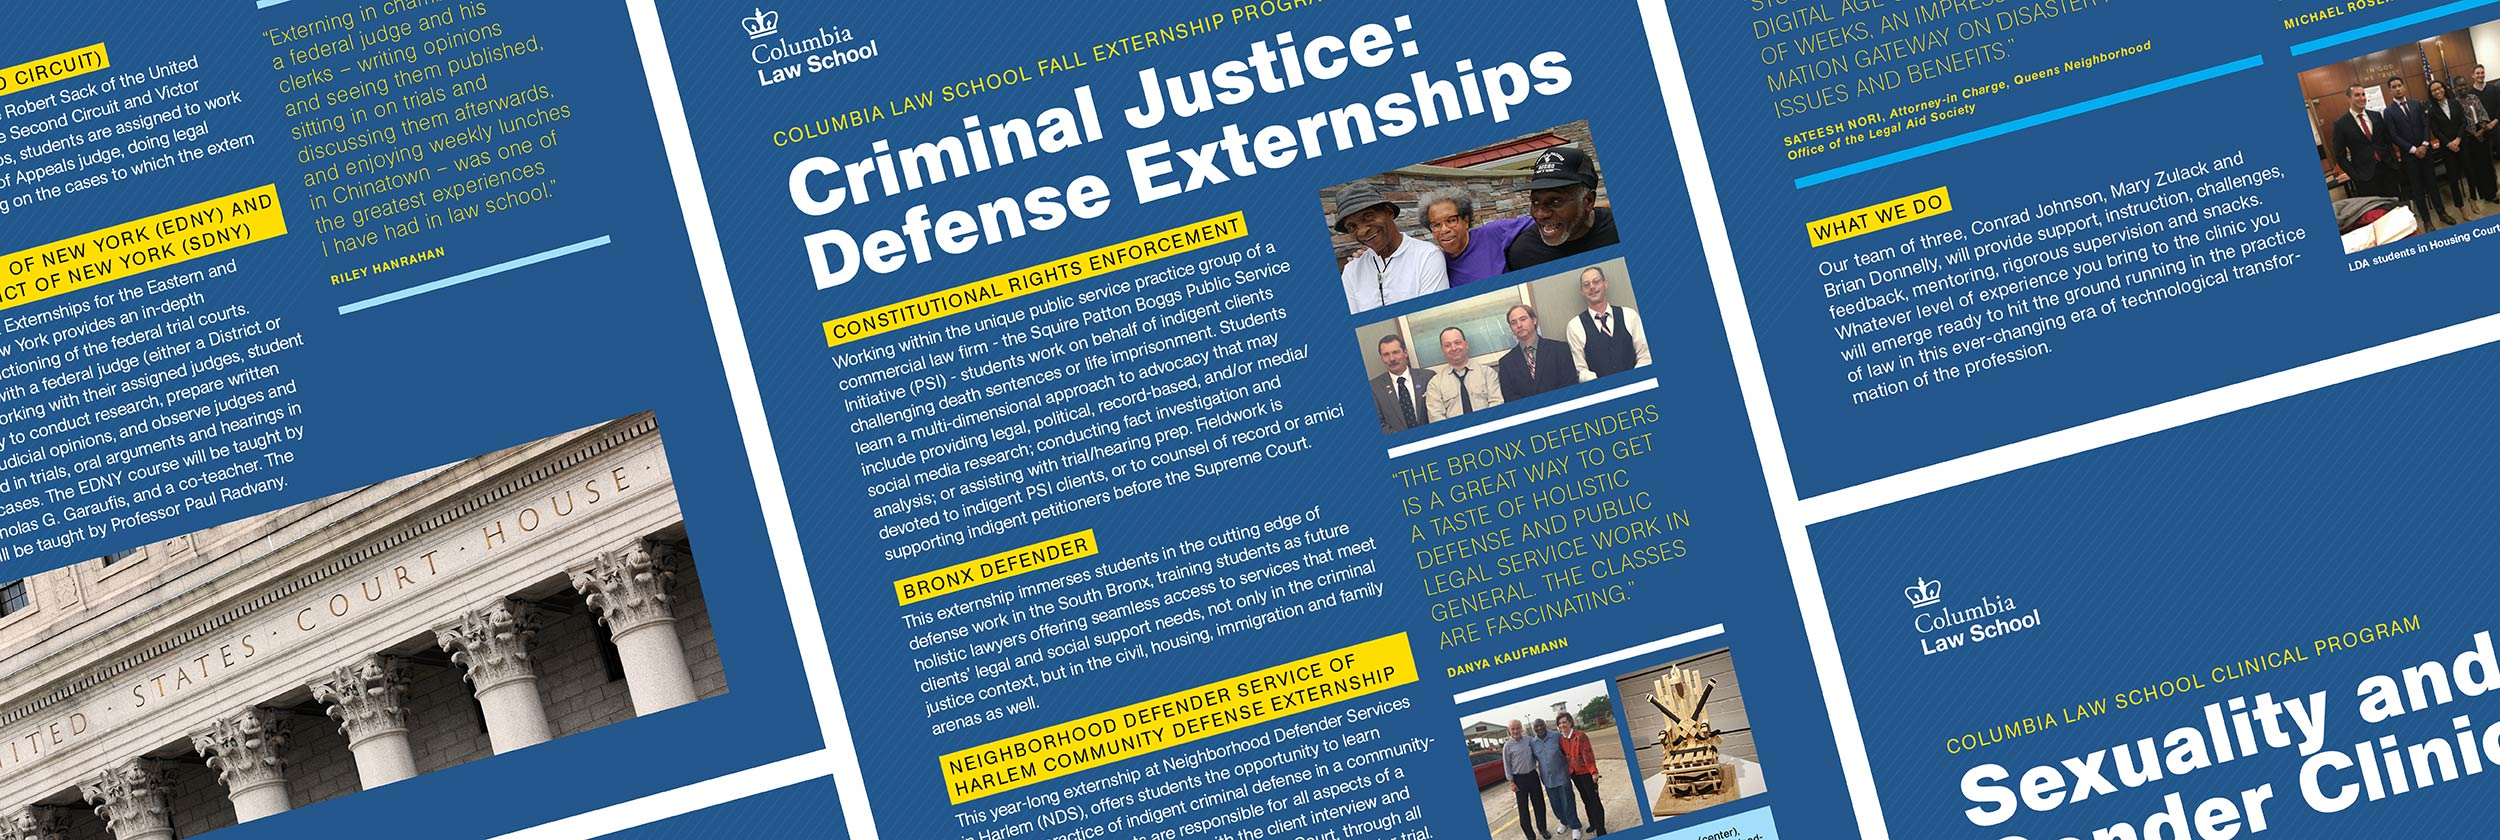 Columbia-Law-School-Poster-closeup1.jpg